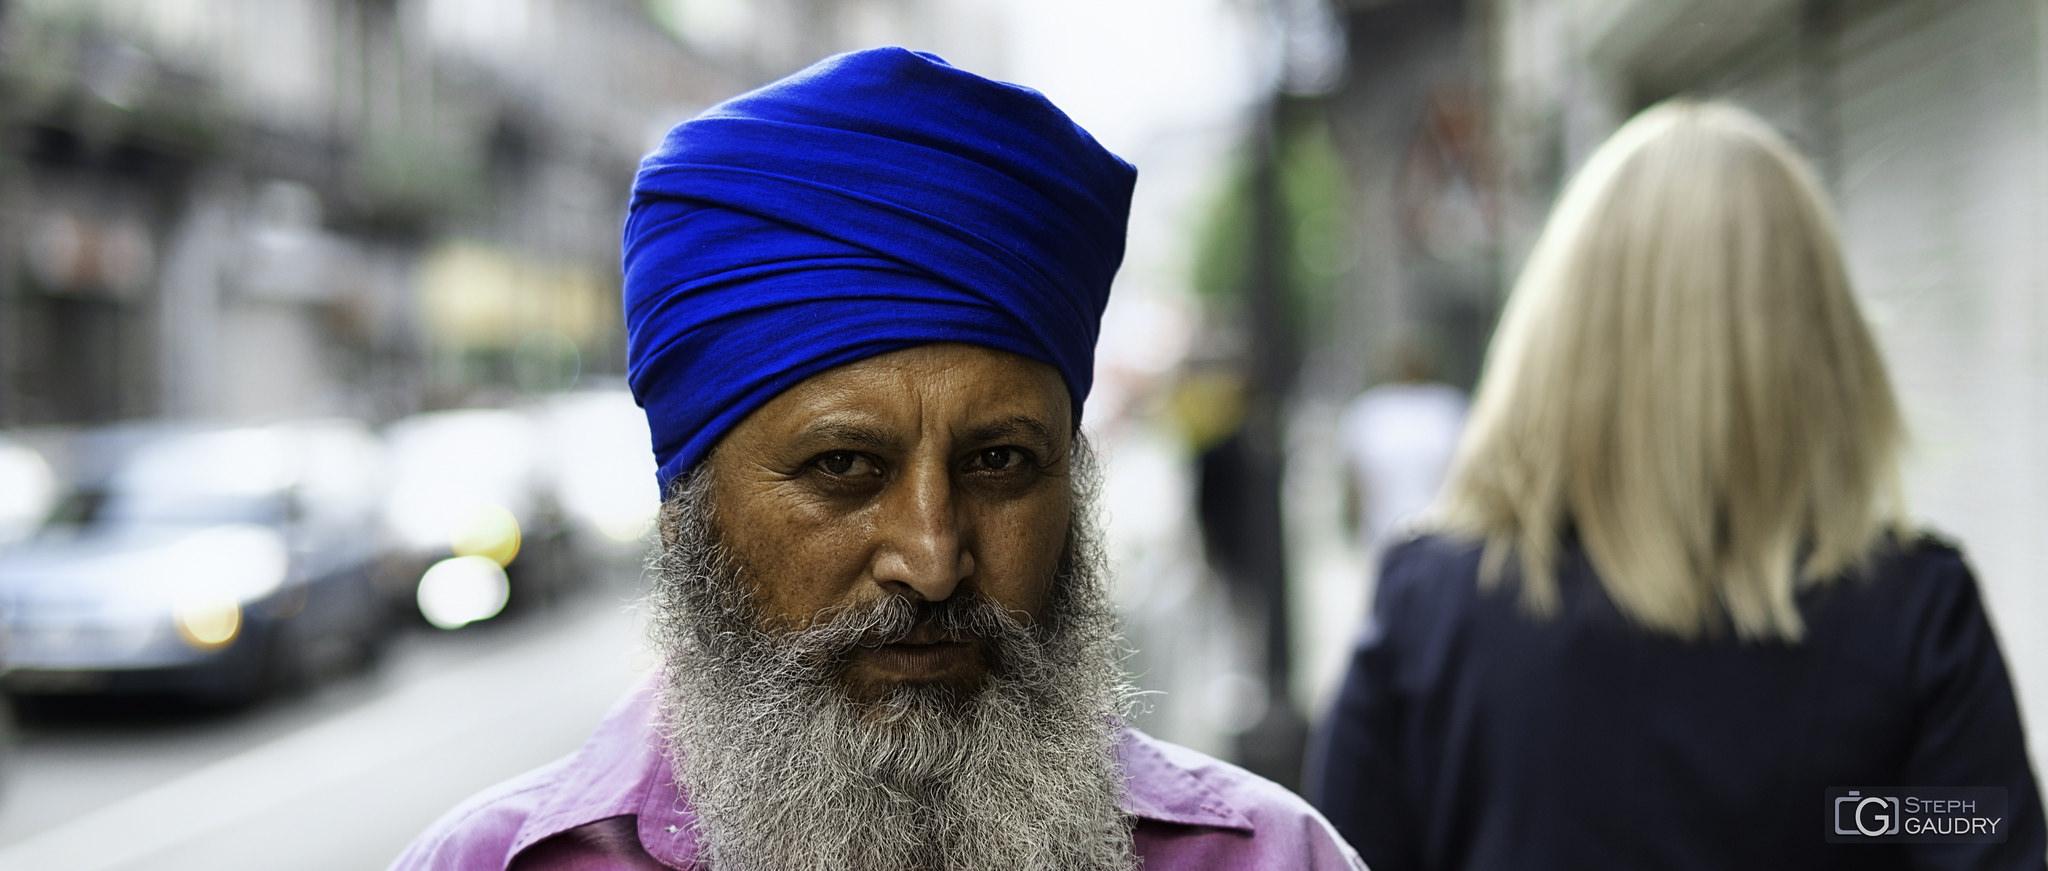 L'homme au turban bleu [Click to start slideshow]